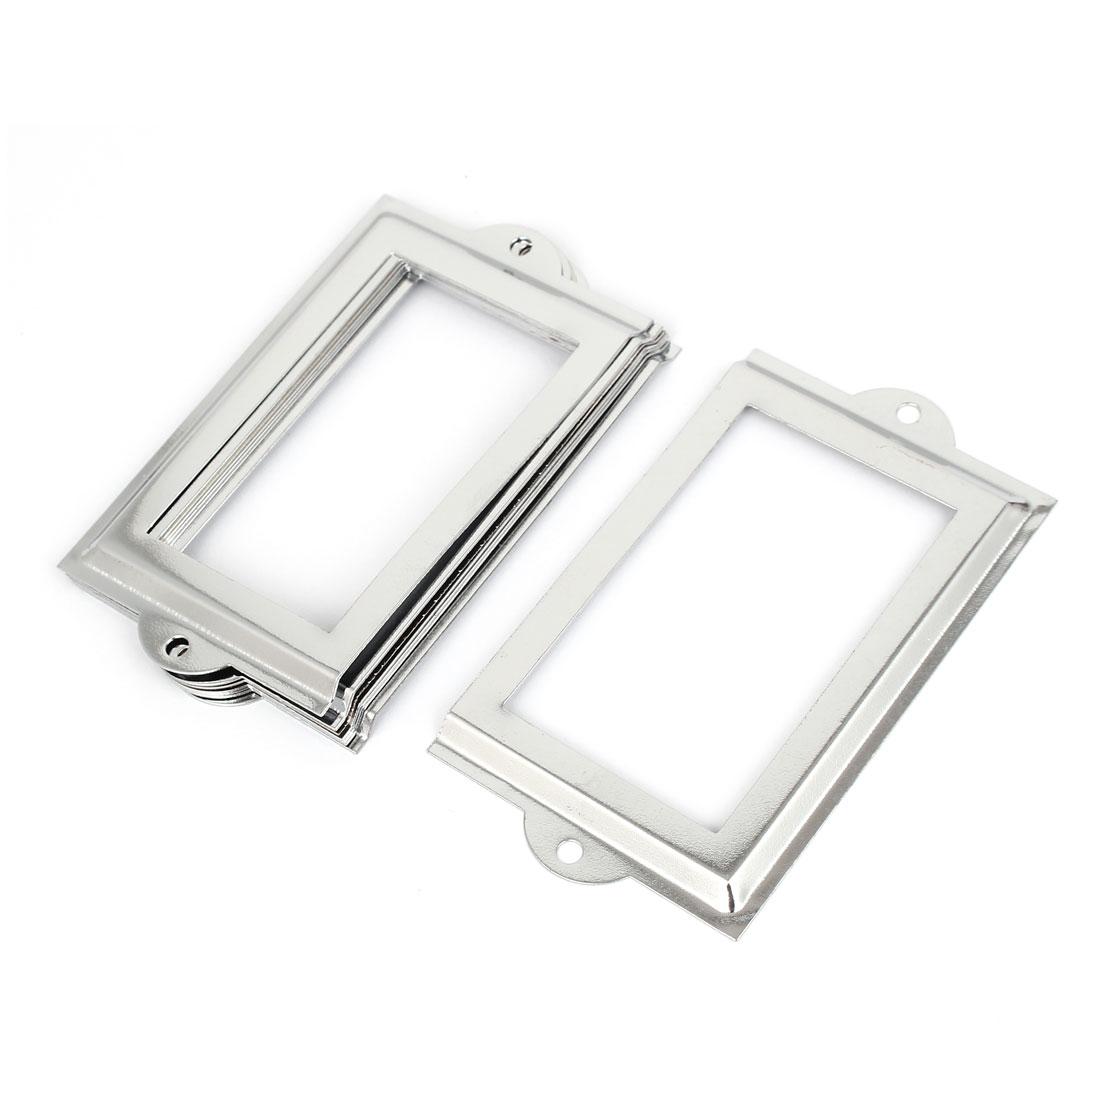 Metal 105mm x 60mm Name Card File Drawer Tag Label Holder Frame Silver Tone 8pcs